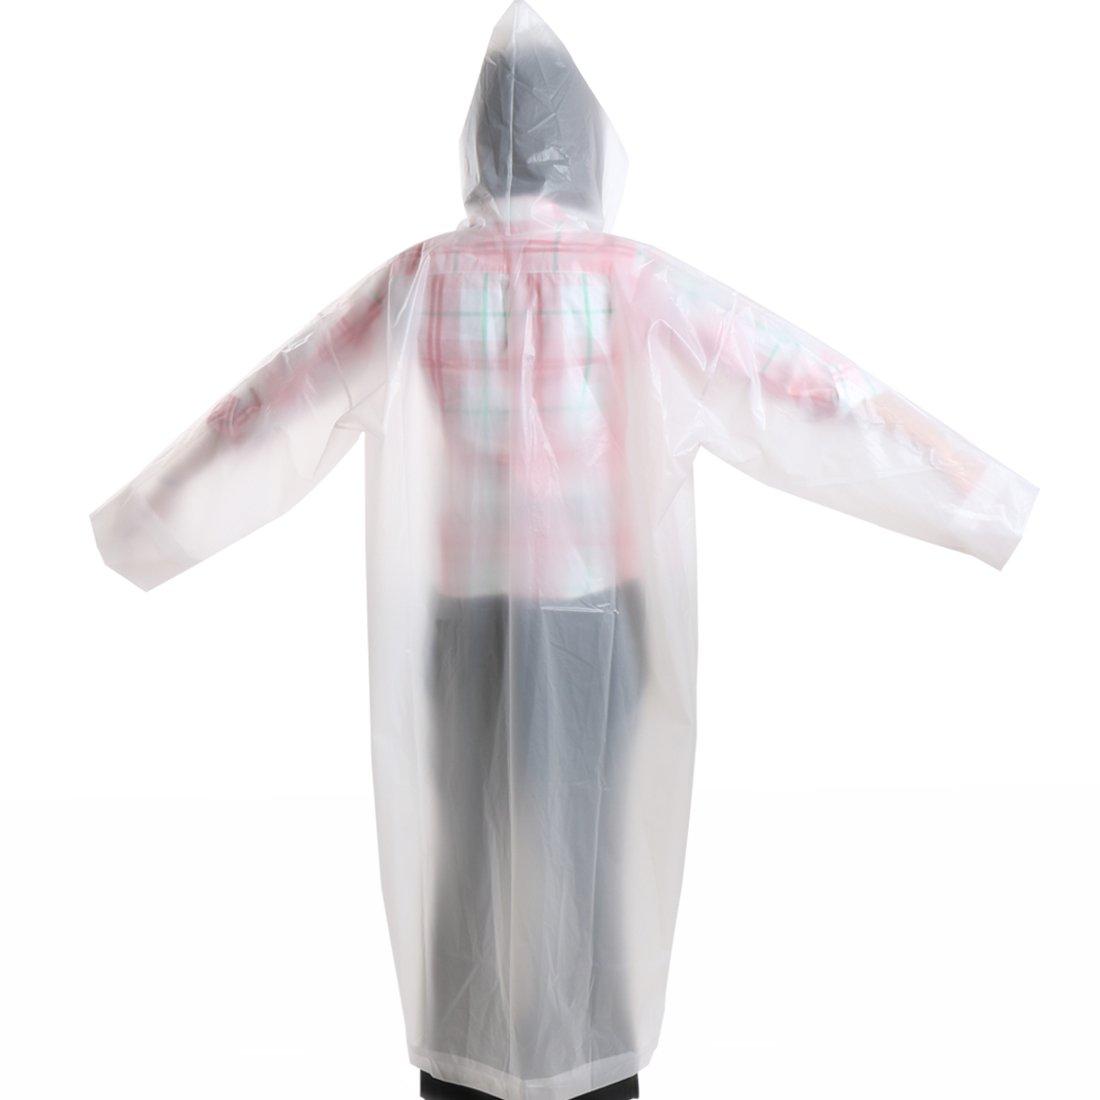 kilofly Waterproof Ultra Light Drawstring Raincoat Long Sleeve Hood Rain Poncho by kilofly (Image #3)